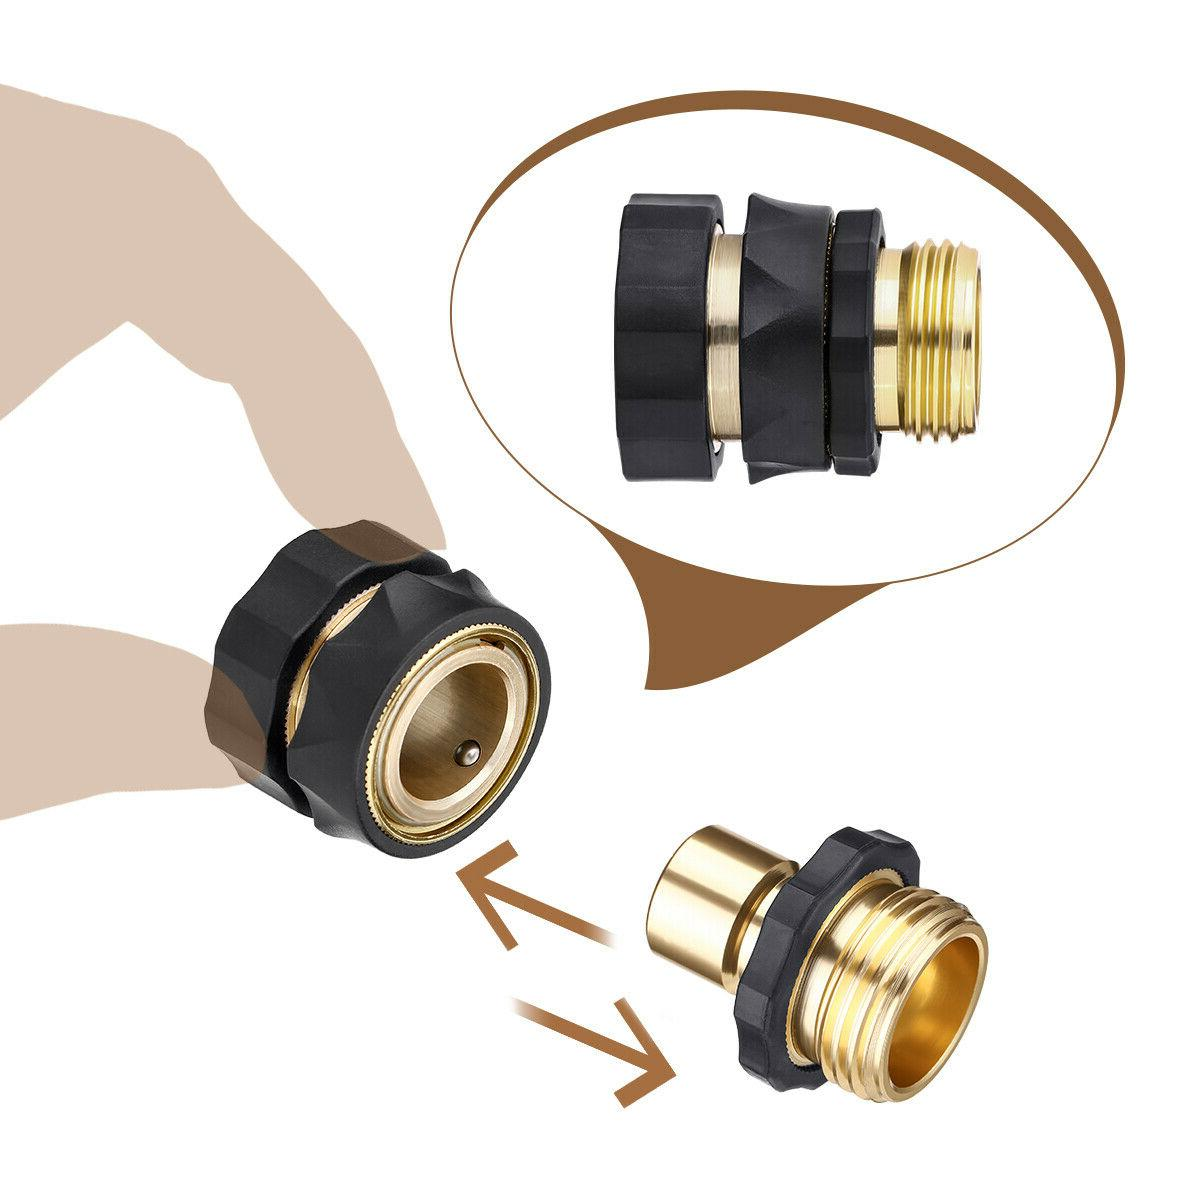 4 3/4' Garden Hose Fit Hose Tap Adapter